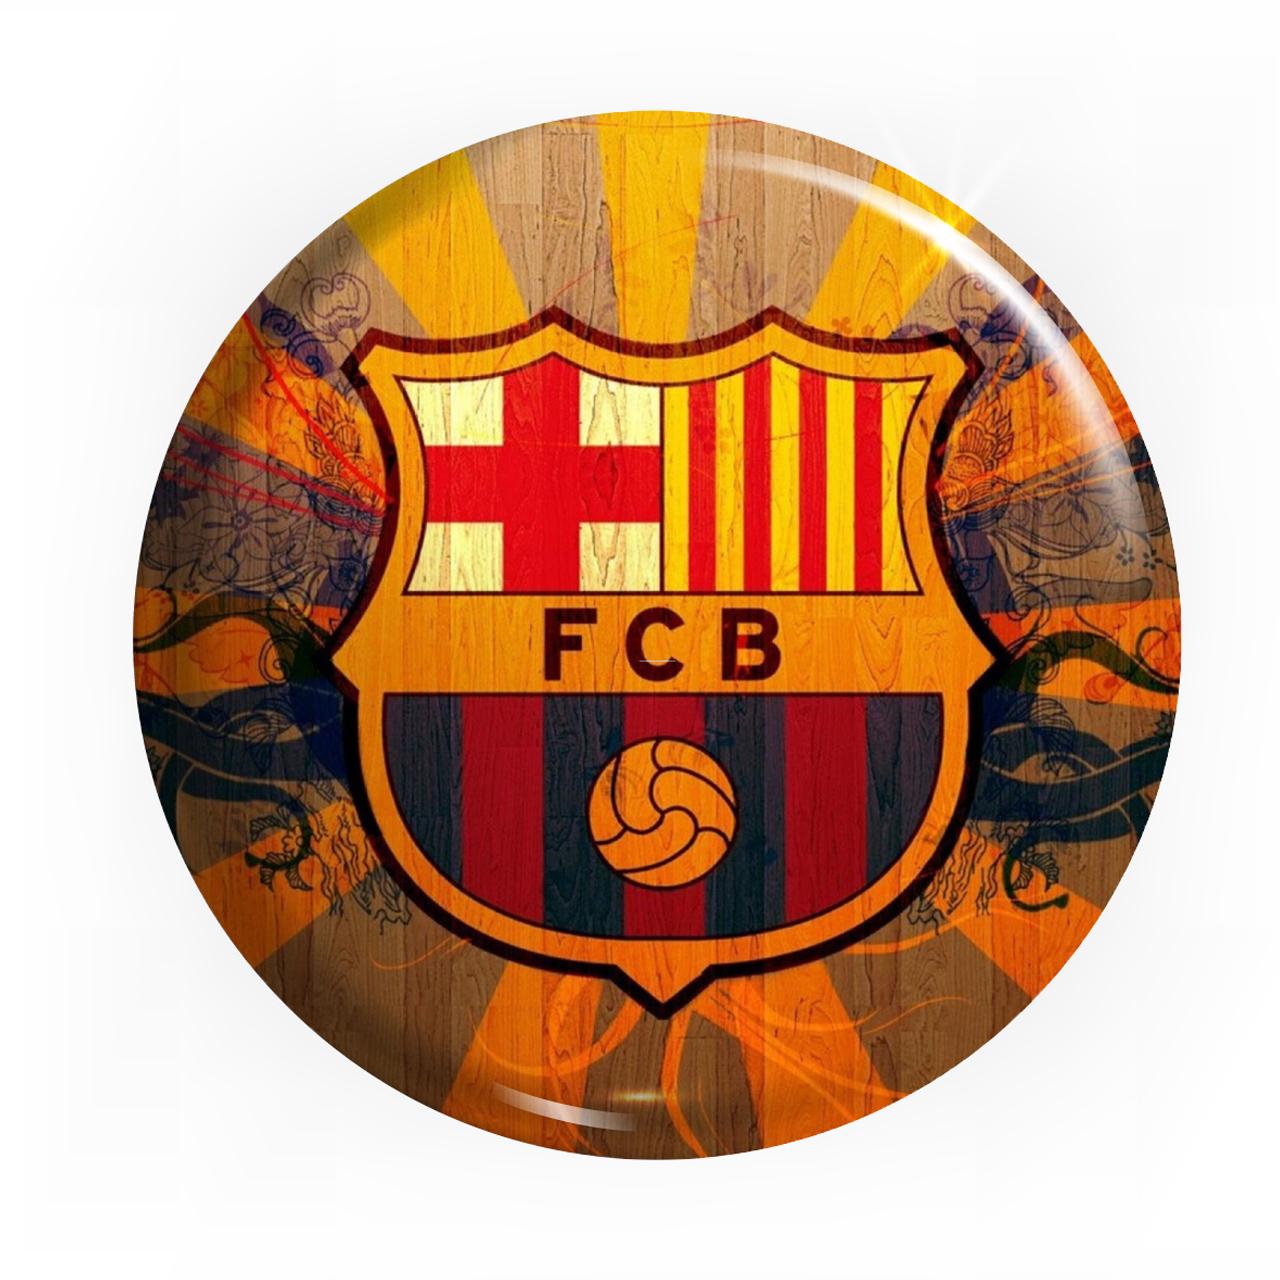 پیکسل طرح تیم بارسلونا کد TiD016